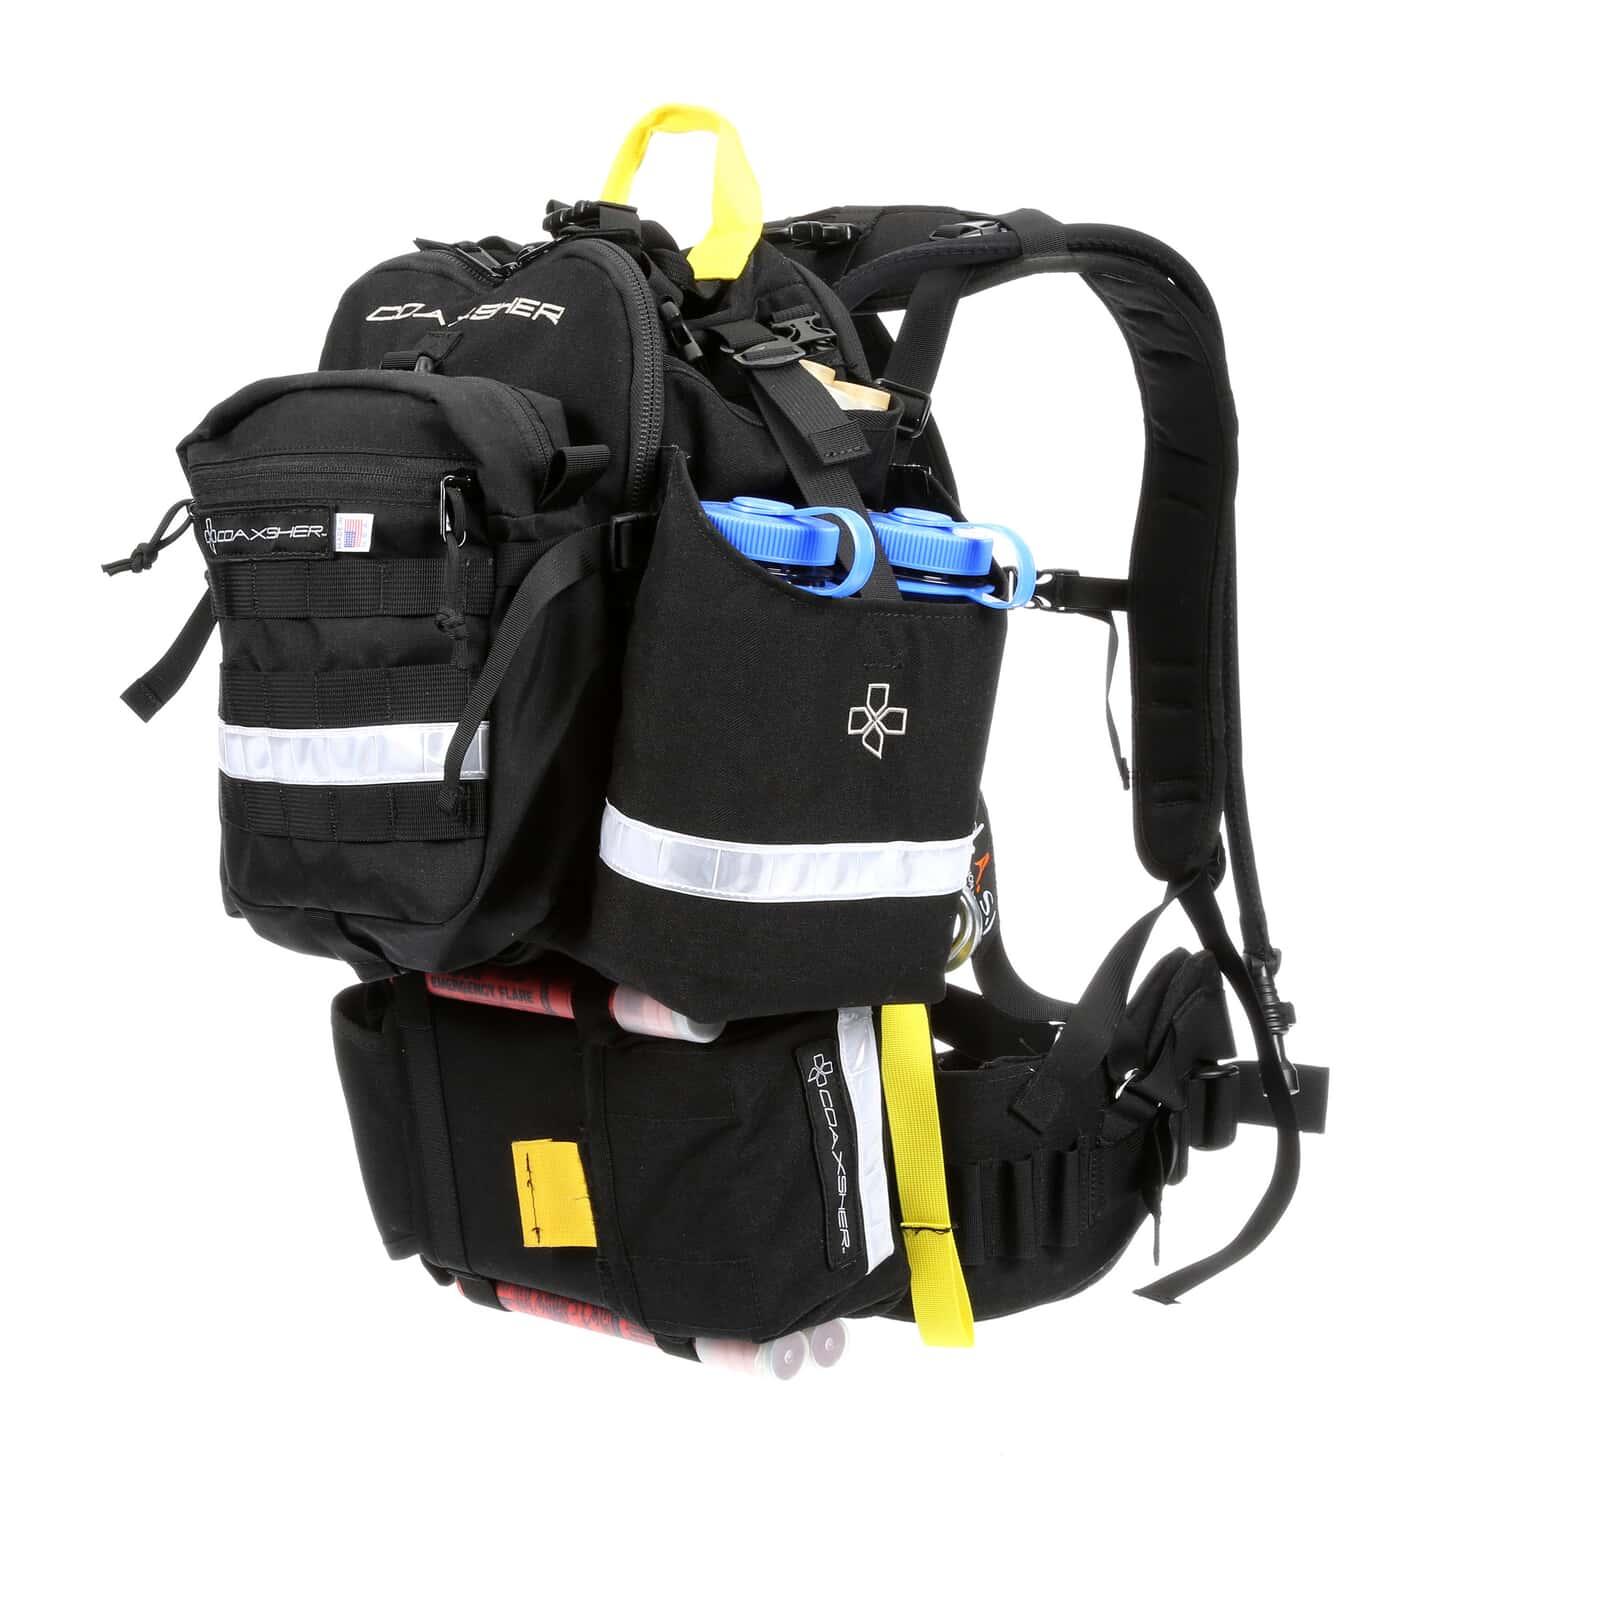 Wildland Fire Pack - Coaxsher FS-1 Ranger wildland fire pack 479ccd1906163